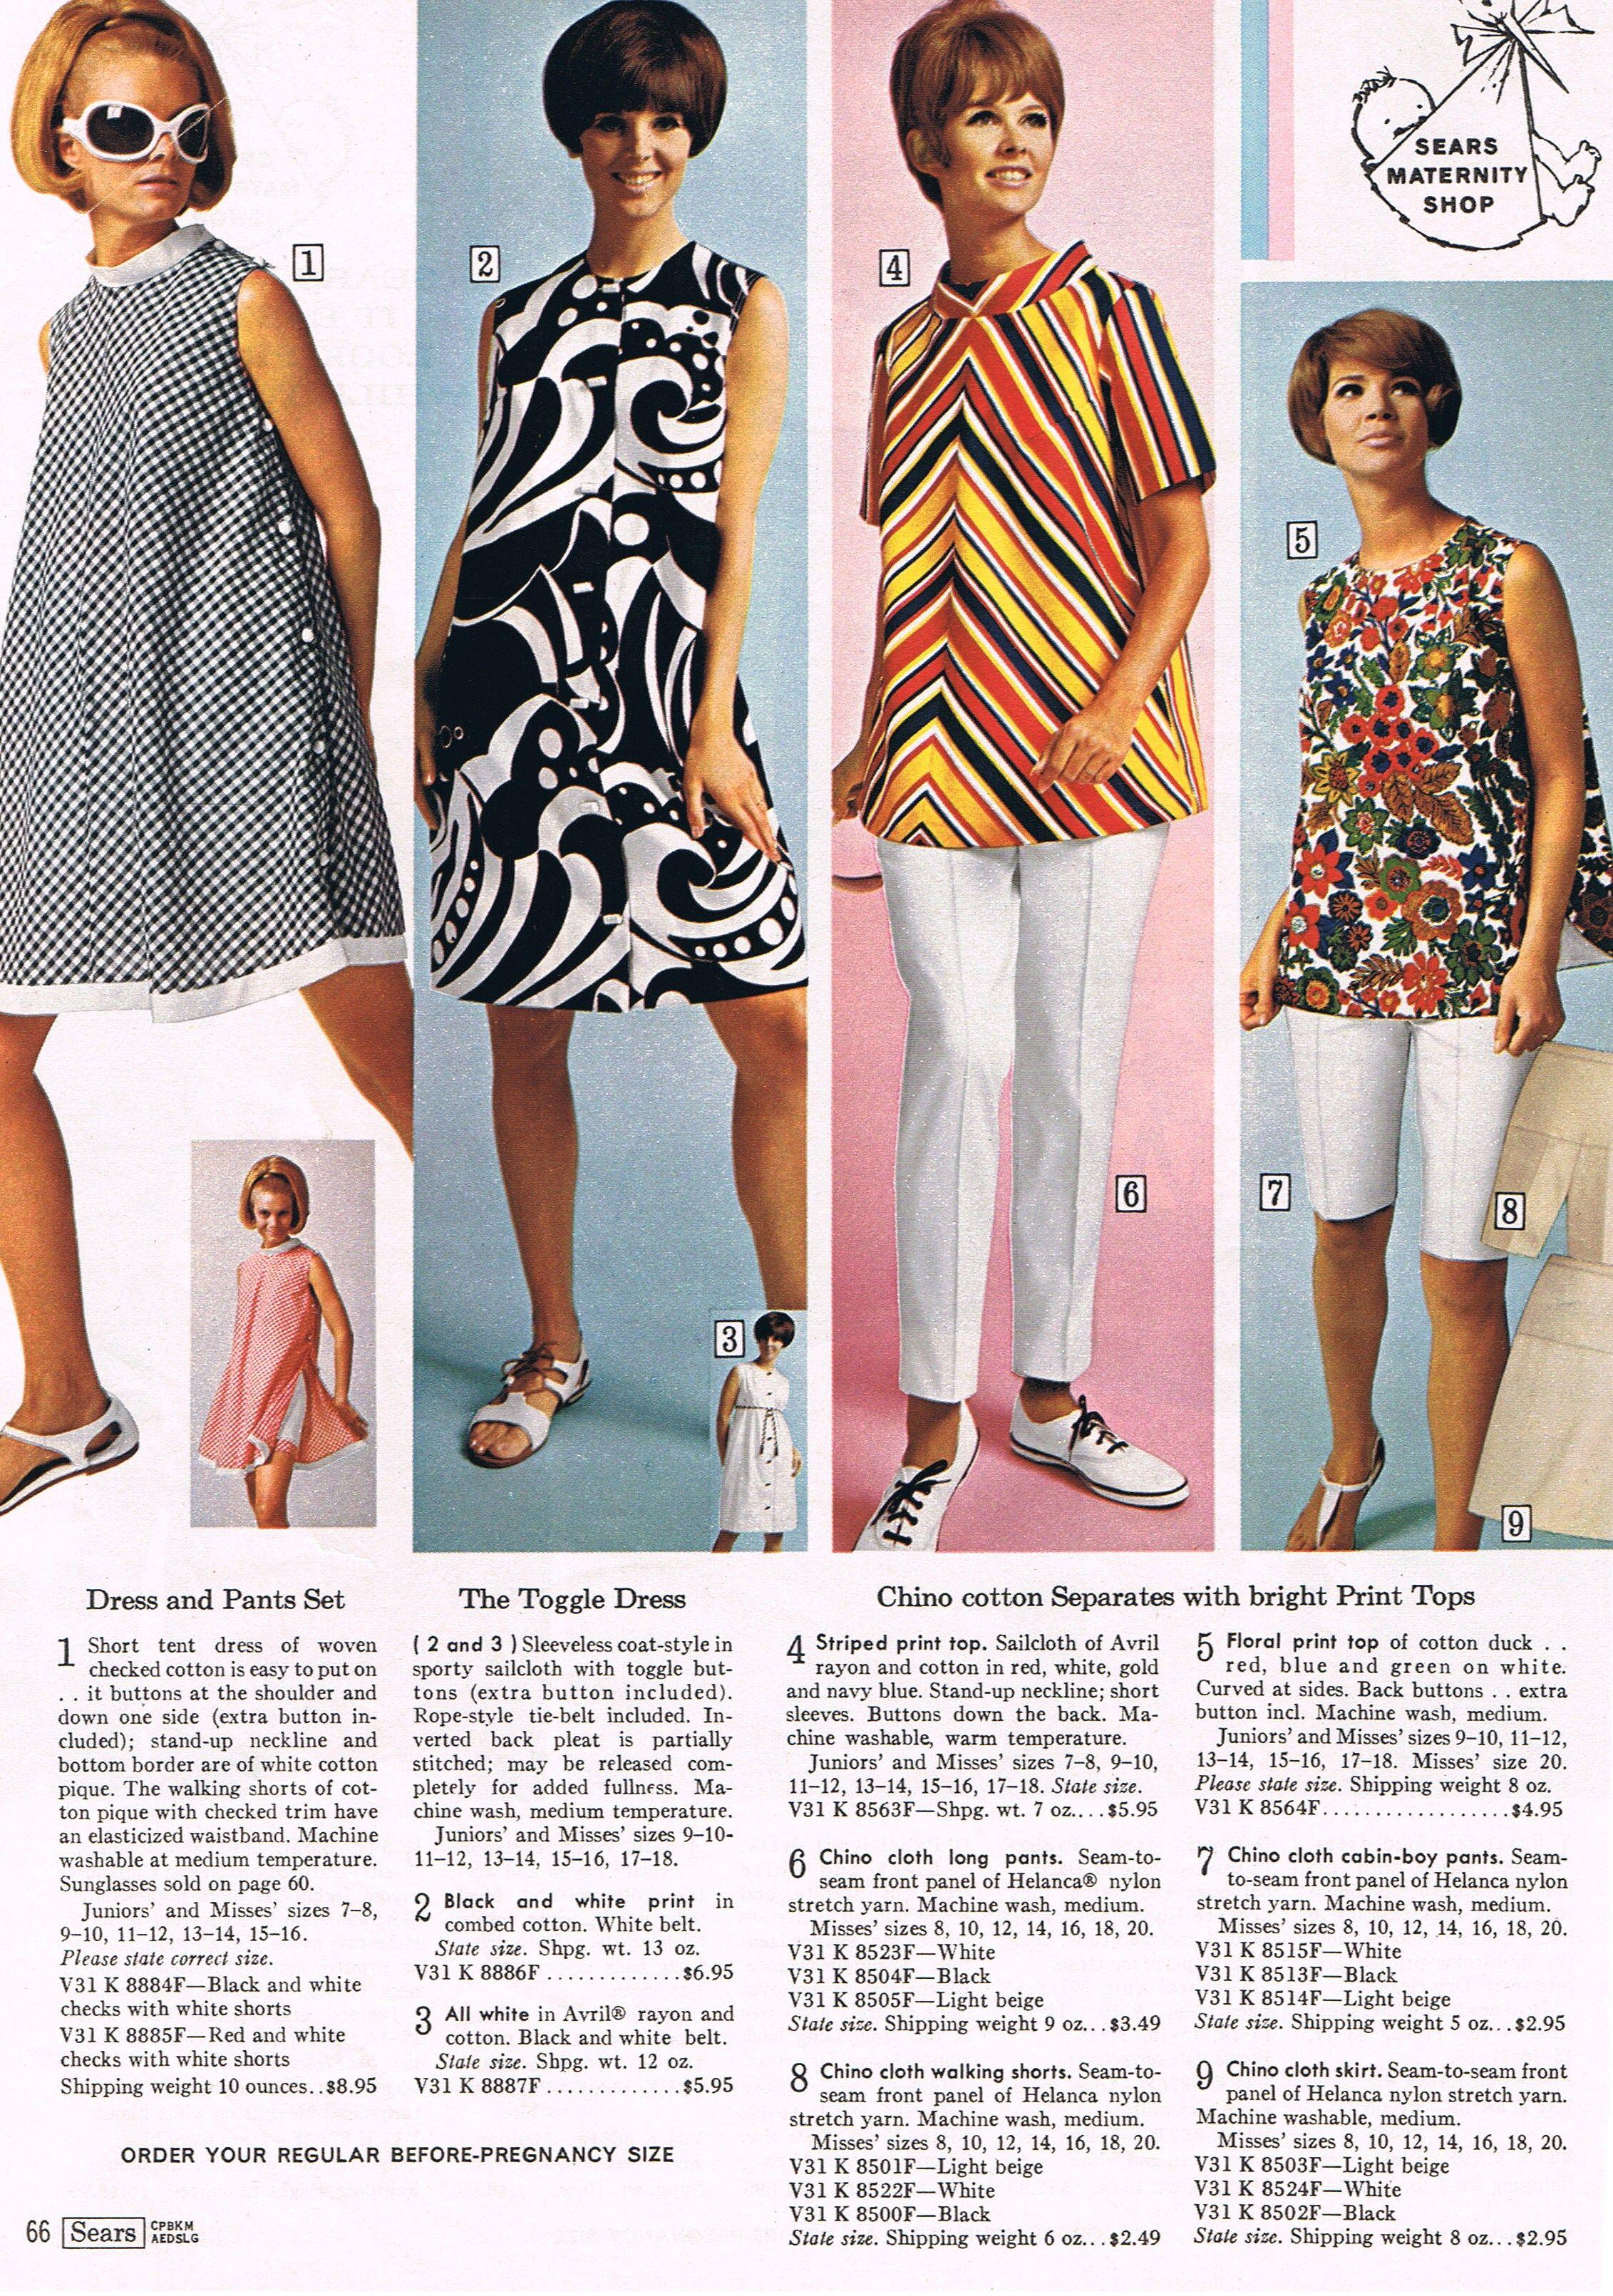 Mod maternity sears 1968 mid mod mail order fashion pinterest mod maternity sears 1968 ombrellifo Choice Image